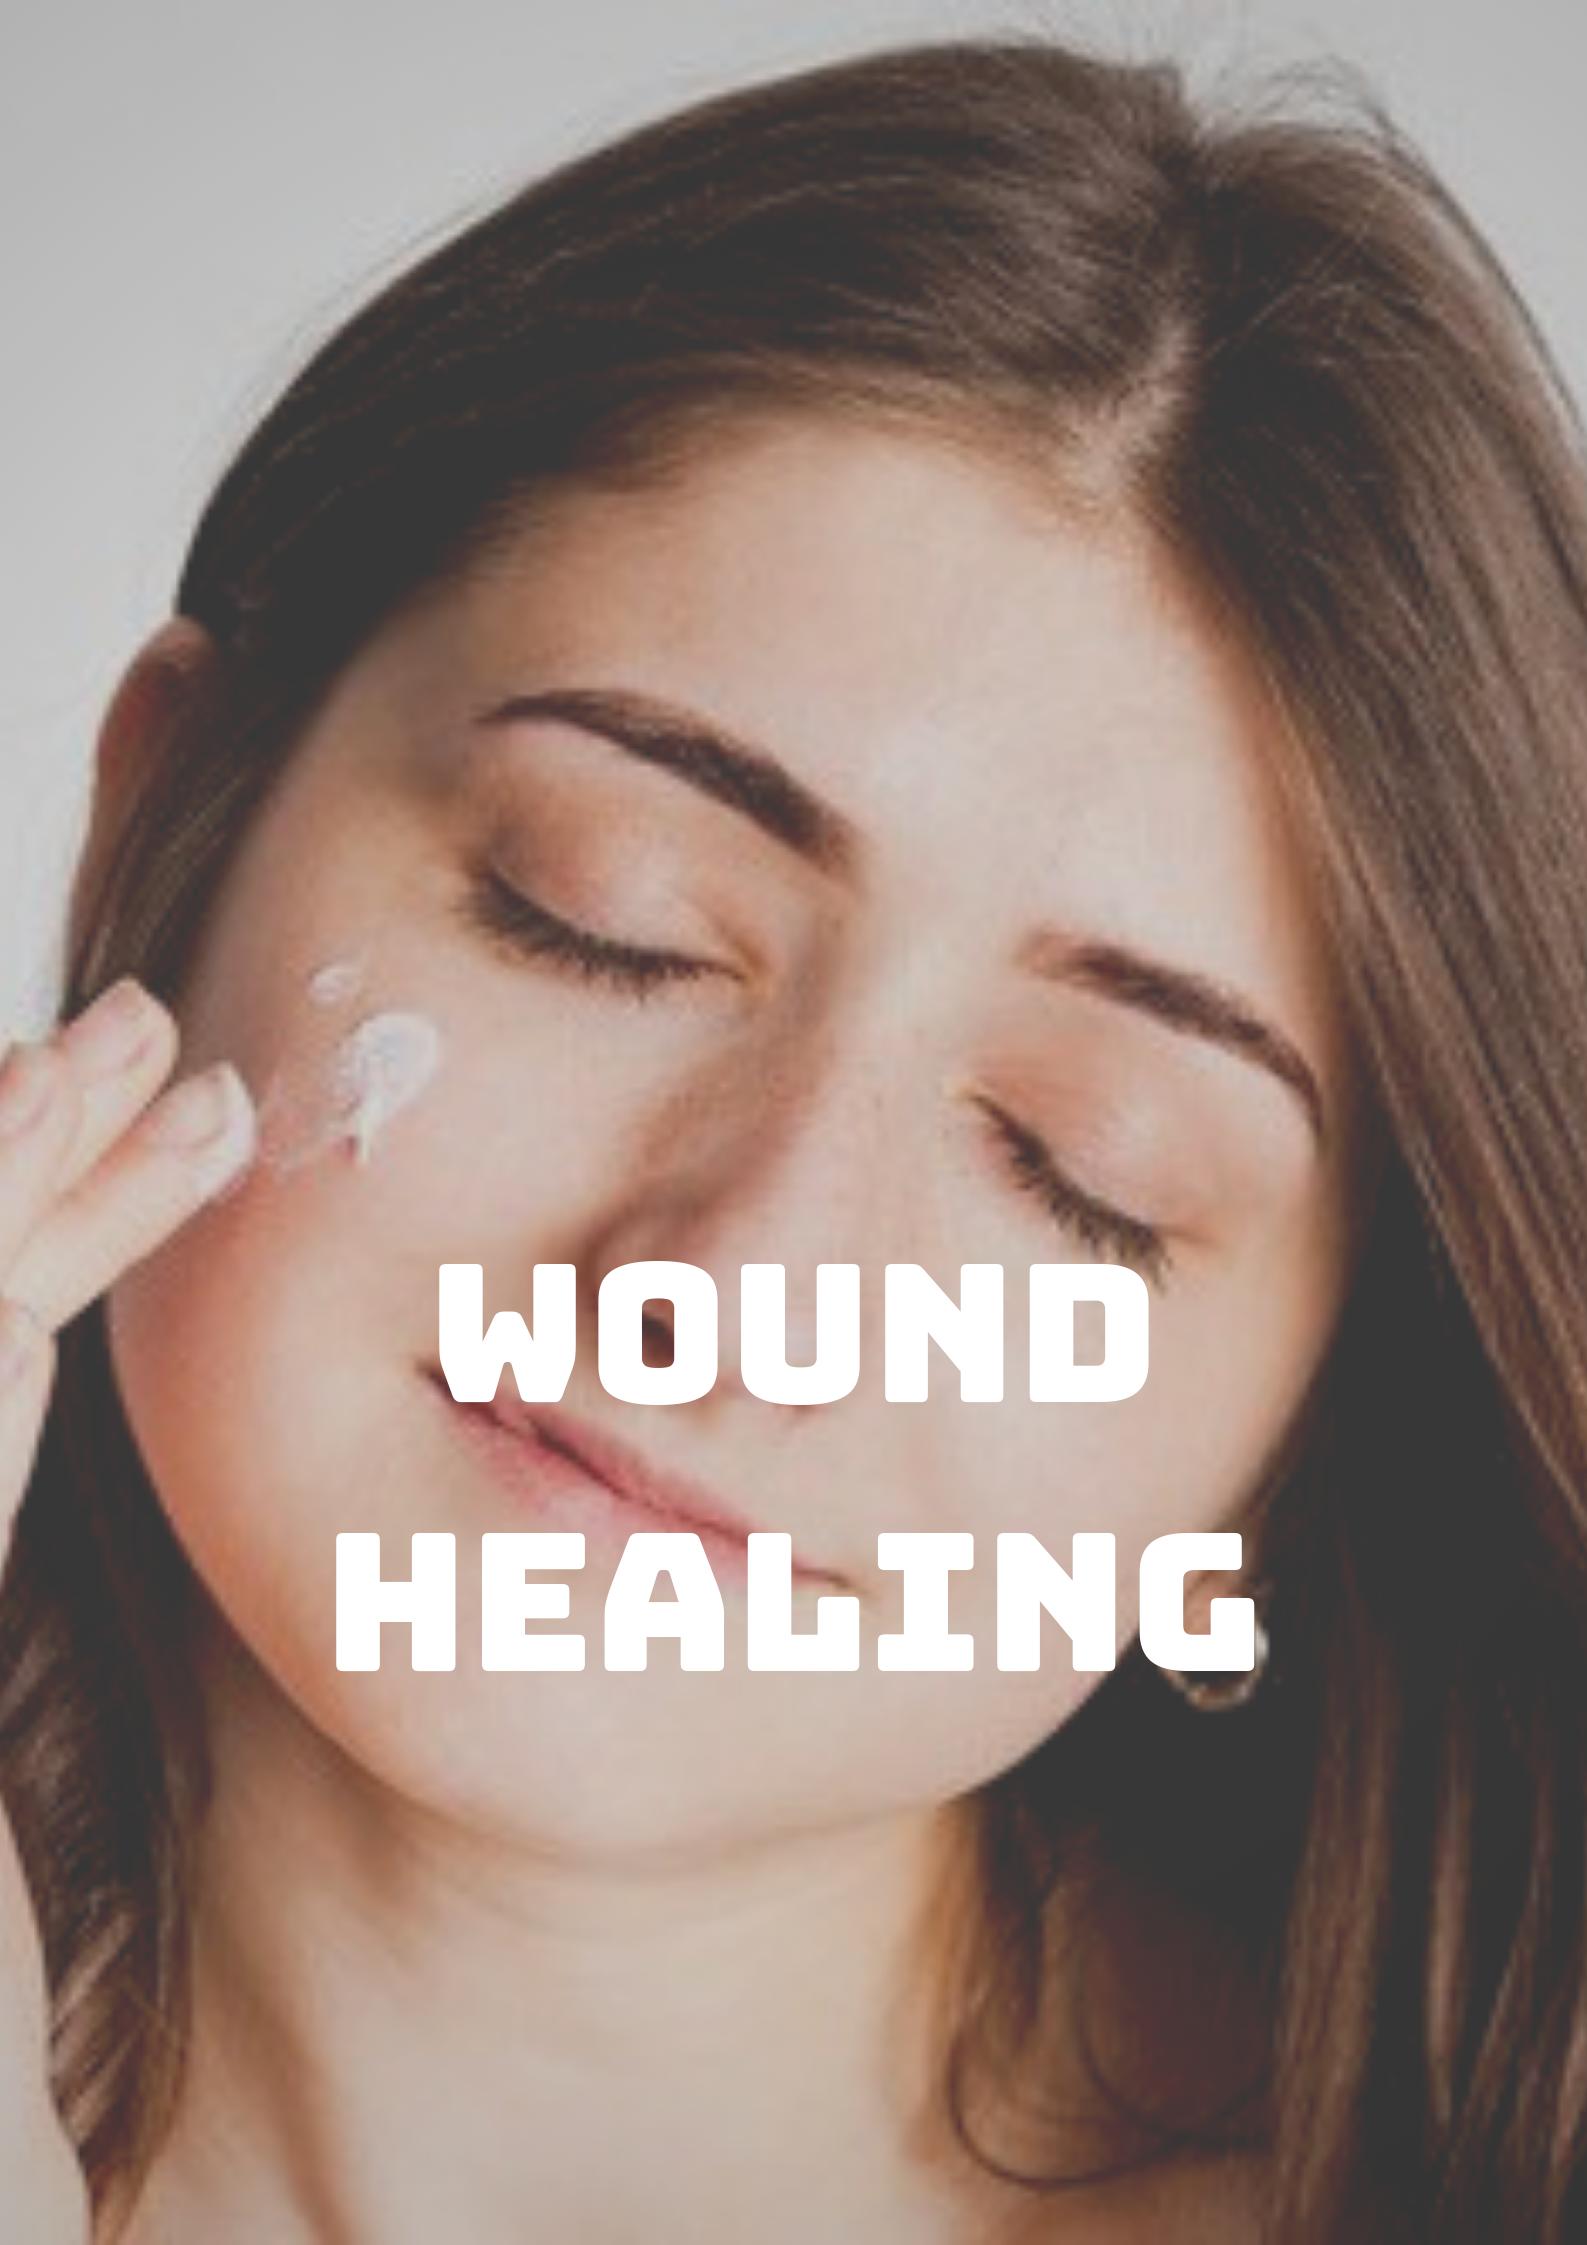 Wound Healing Photo